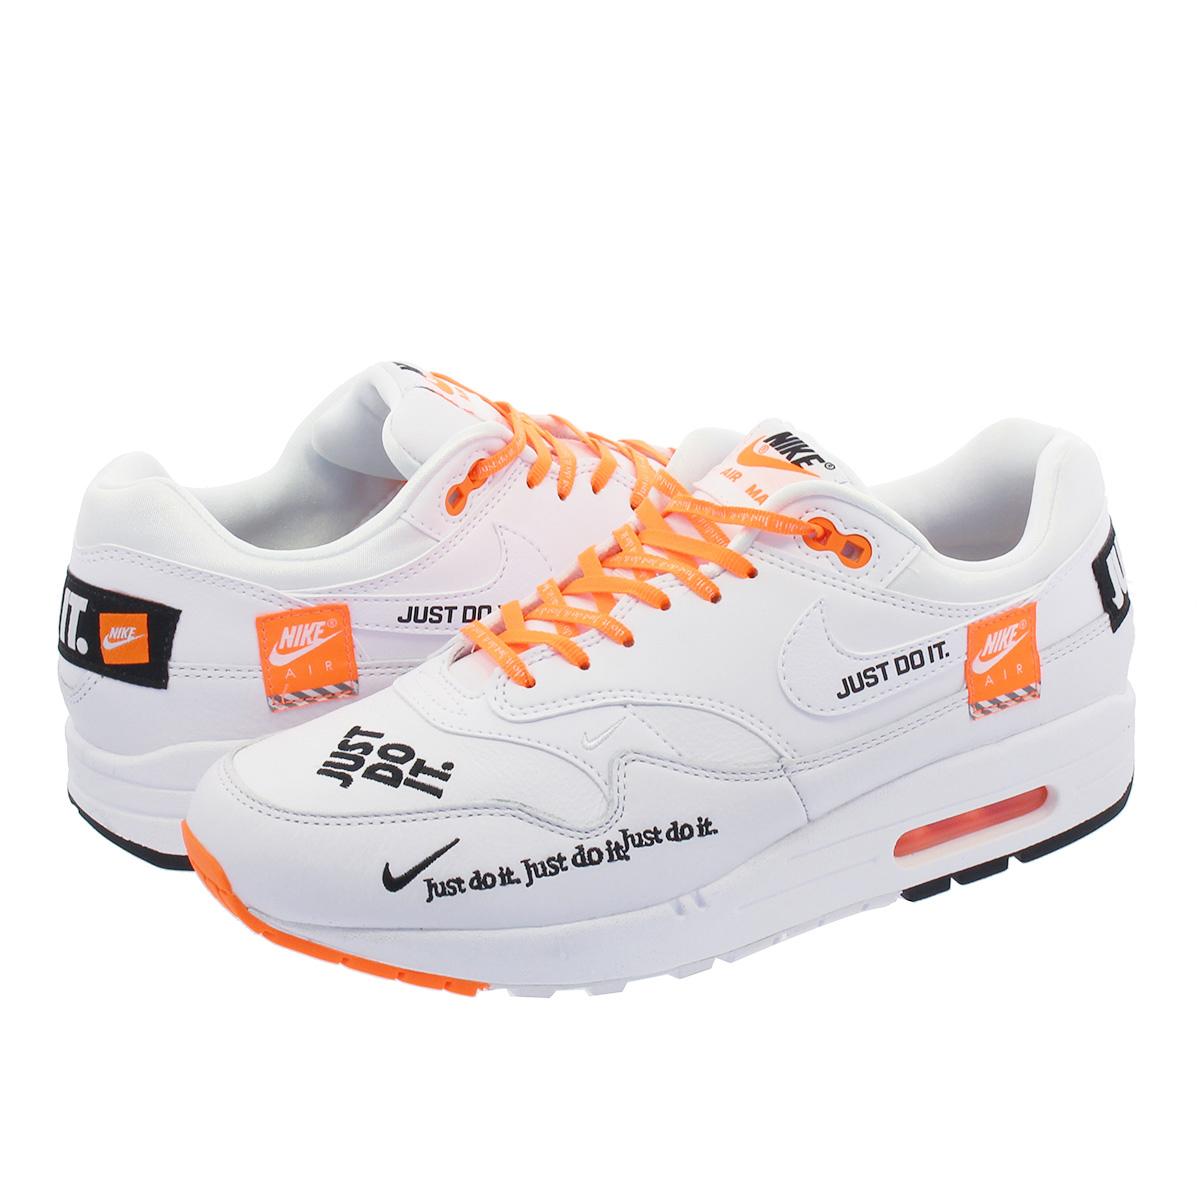 Nike Air Max 1 LX WMNS White Black Total Orange | Footshop